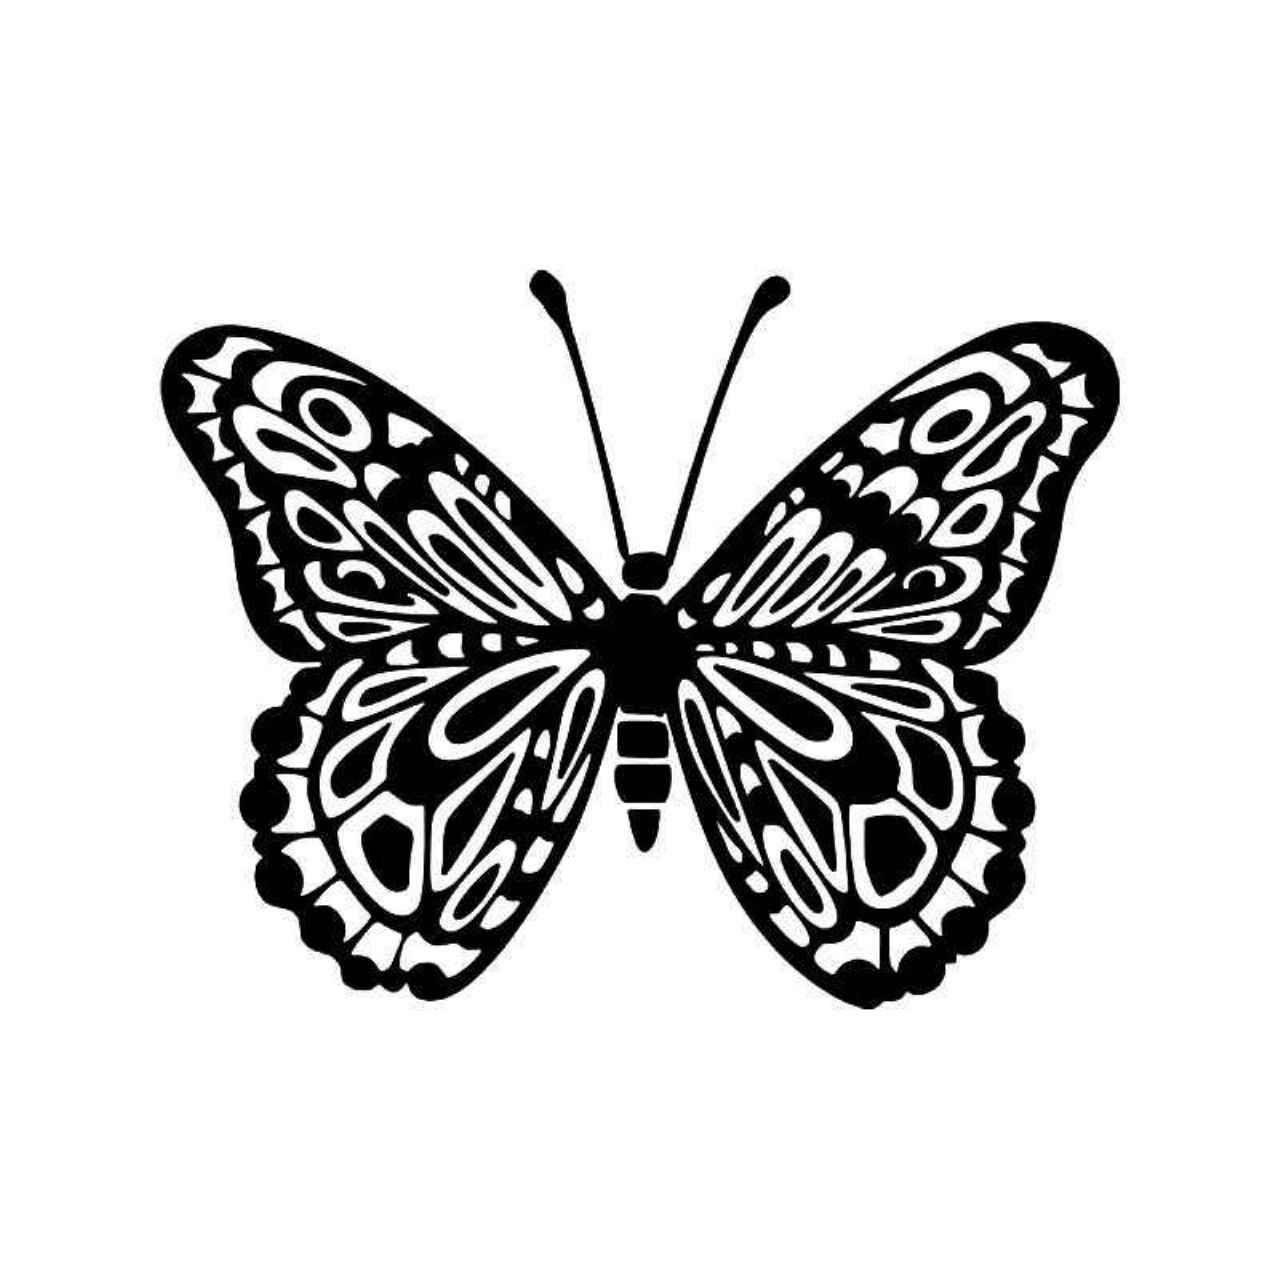 Tribal Butterfly 7 Vinyl Decal Sticker